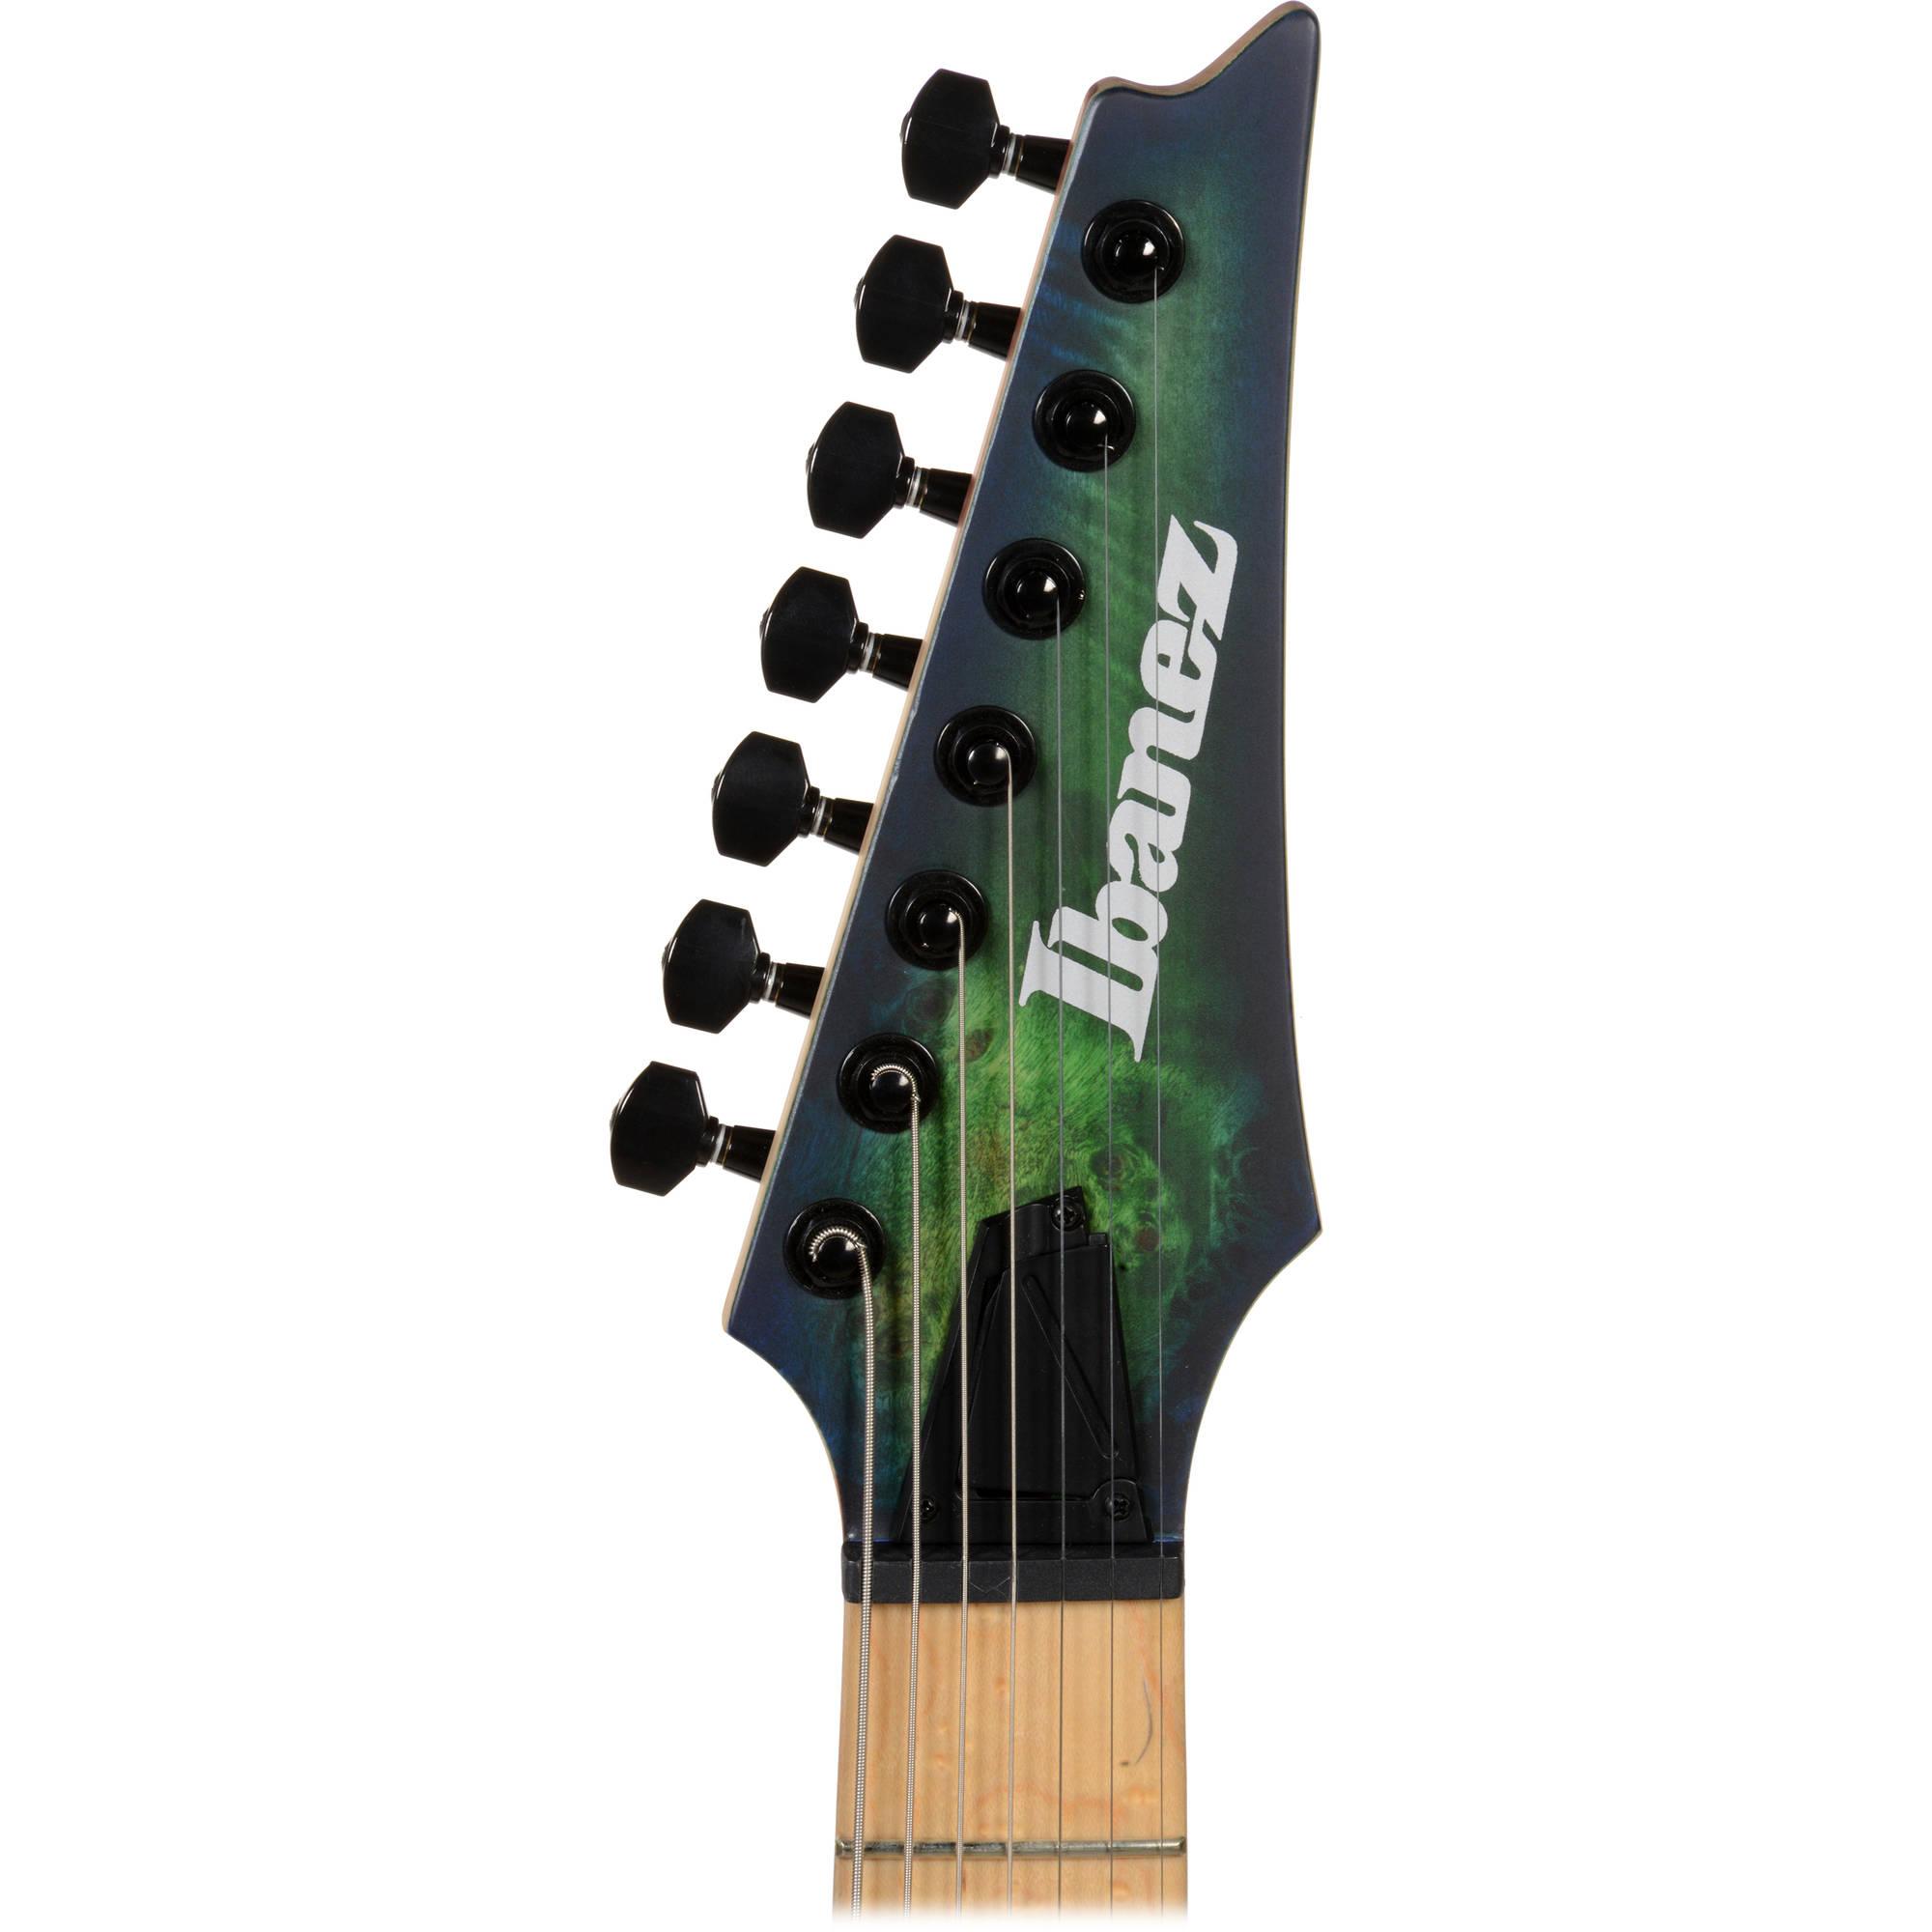 Ibanez RGDIX7MPB RGD Iron Label Series 7-String Electric Guitar (Surreal  Blue Burst)